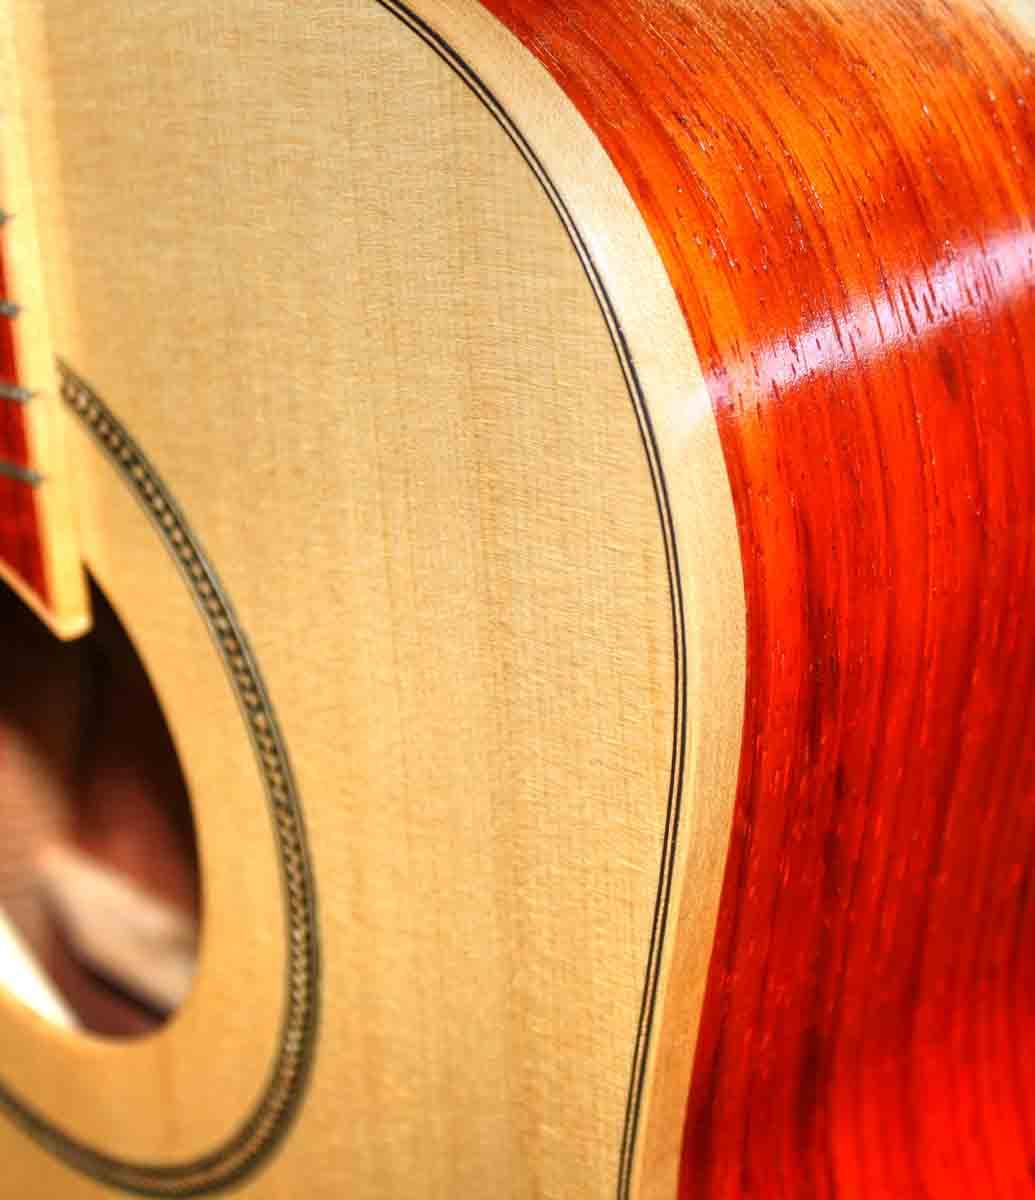 my new guitar maker story